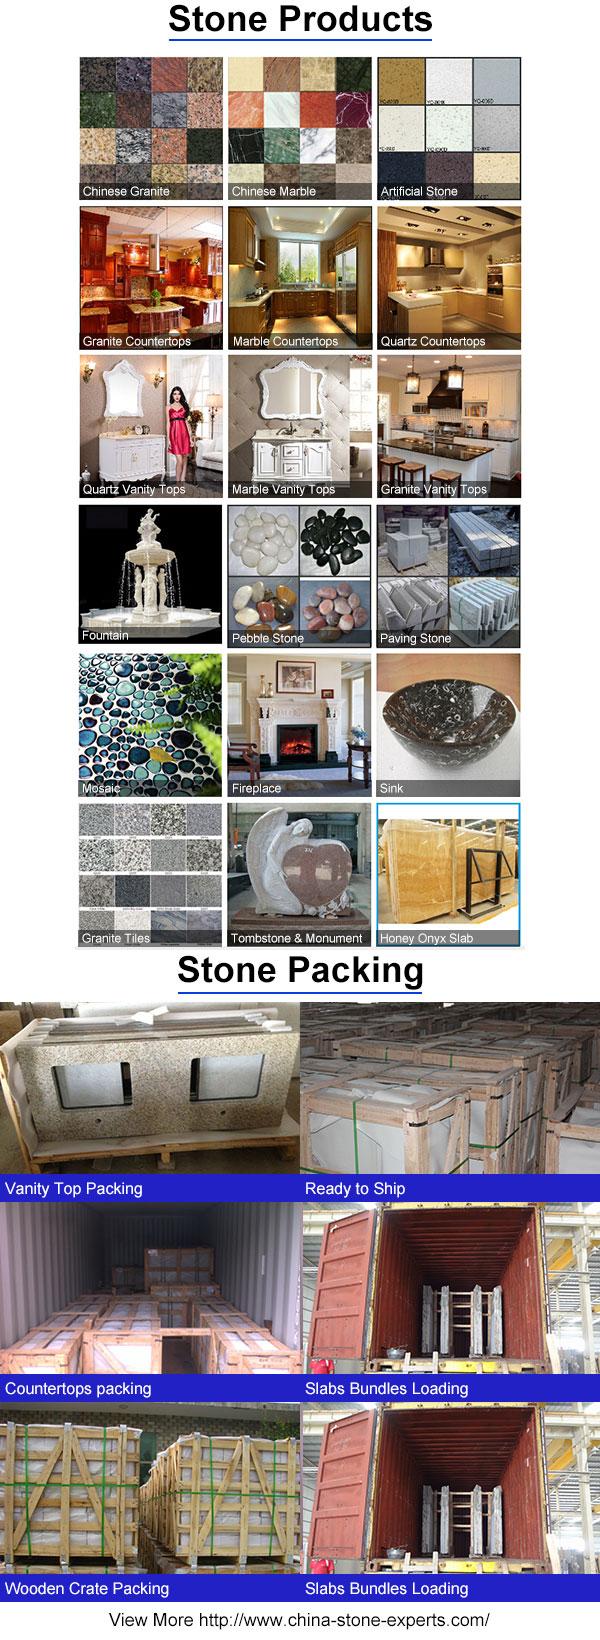 02 Yeyang Stone Products+Packing-2.jpg